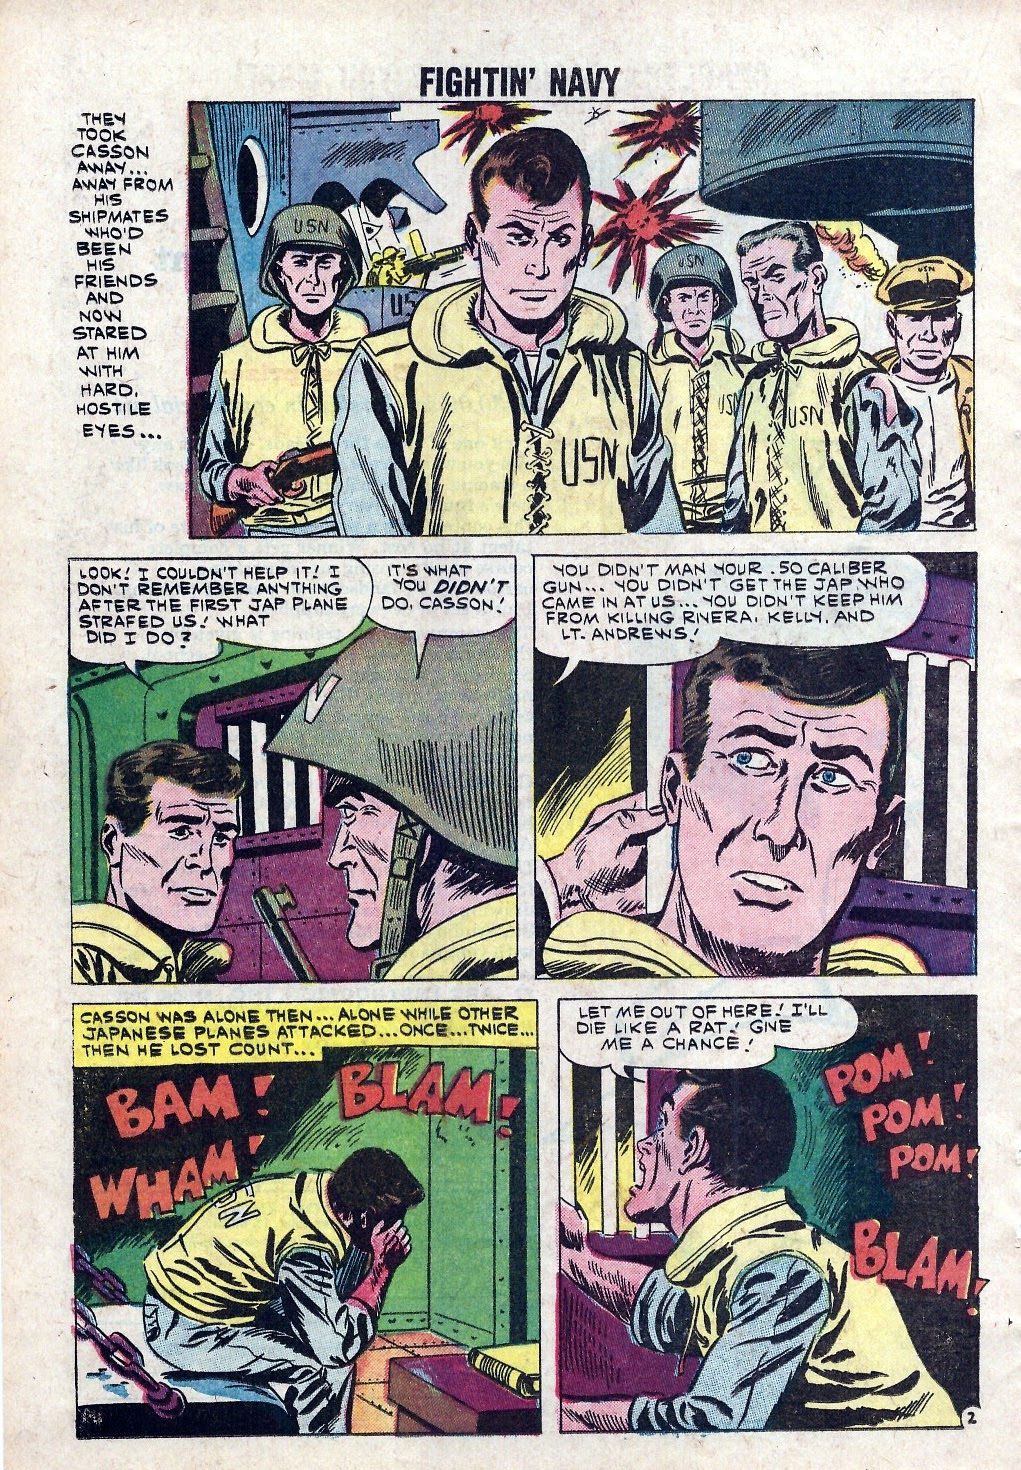 Read online Fightin' Navy comic -  Issue #94 - 16